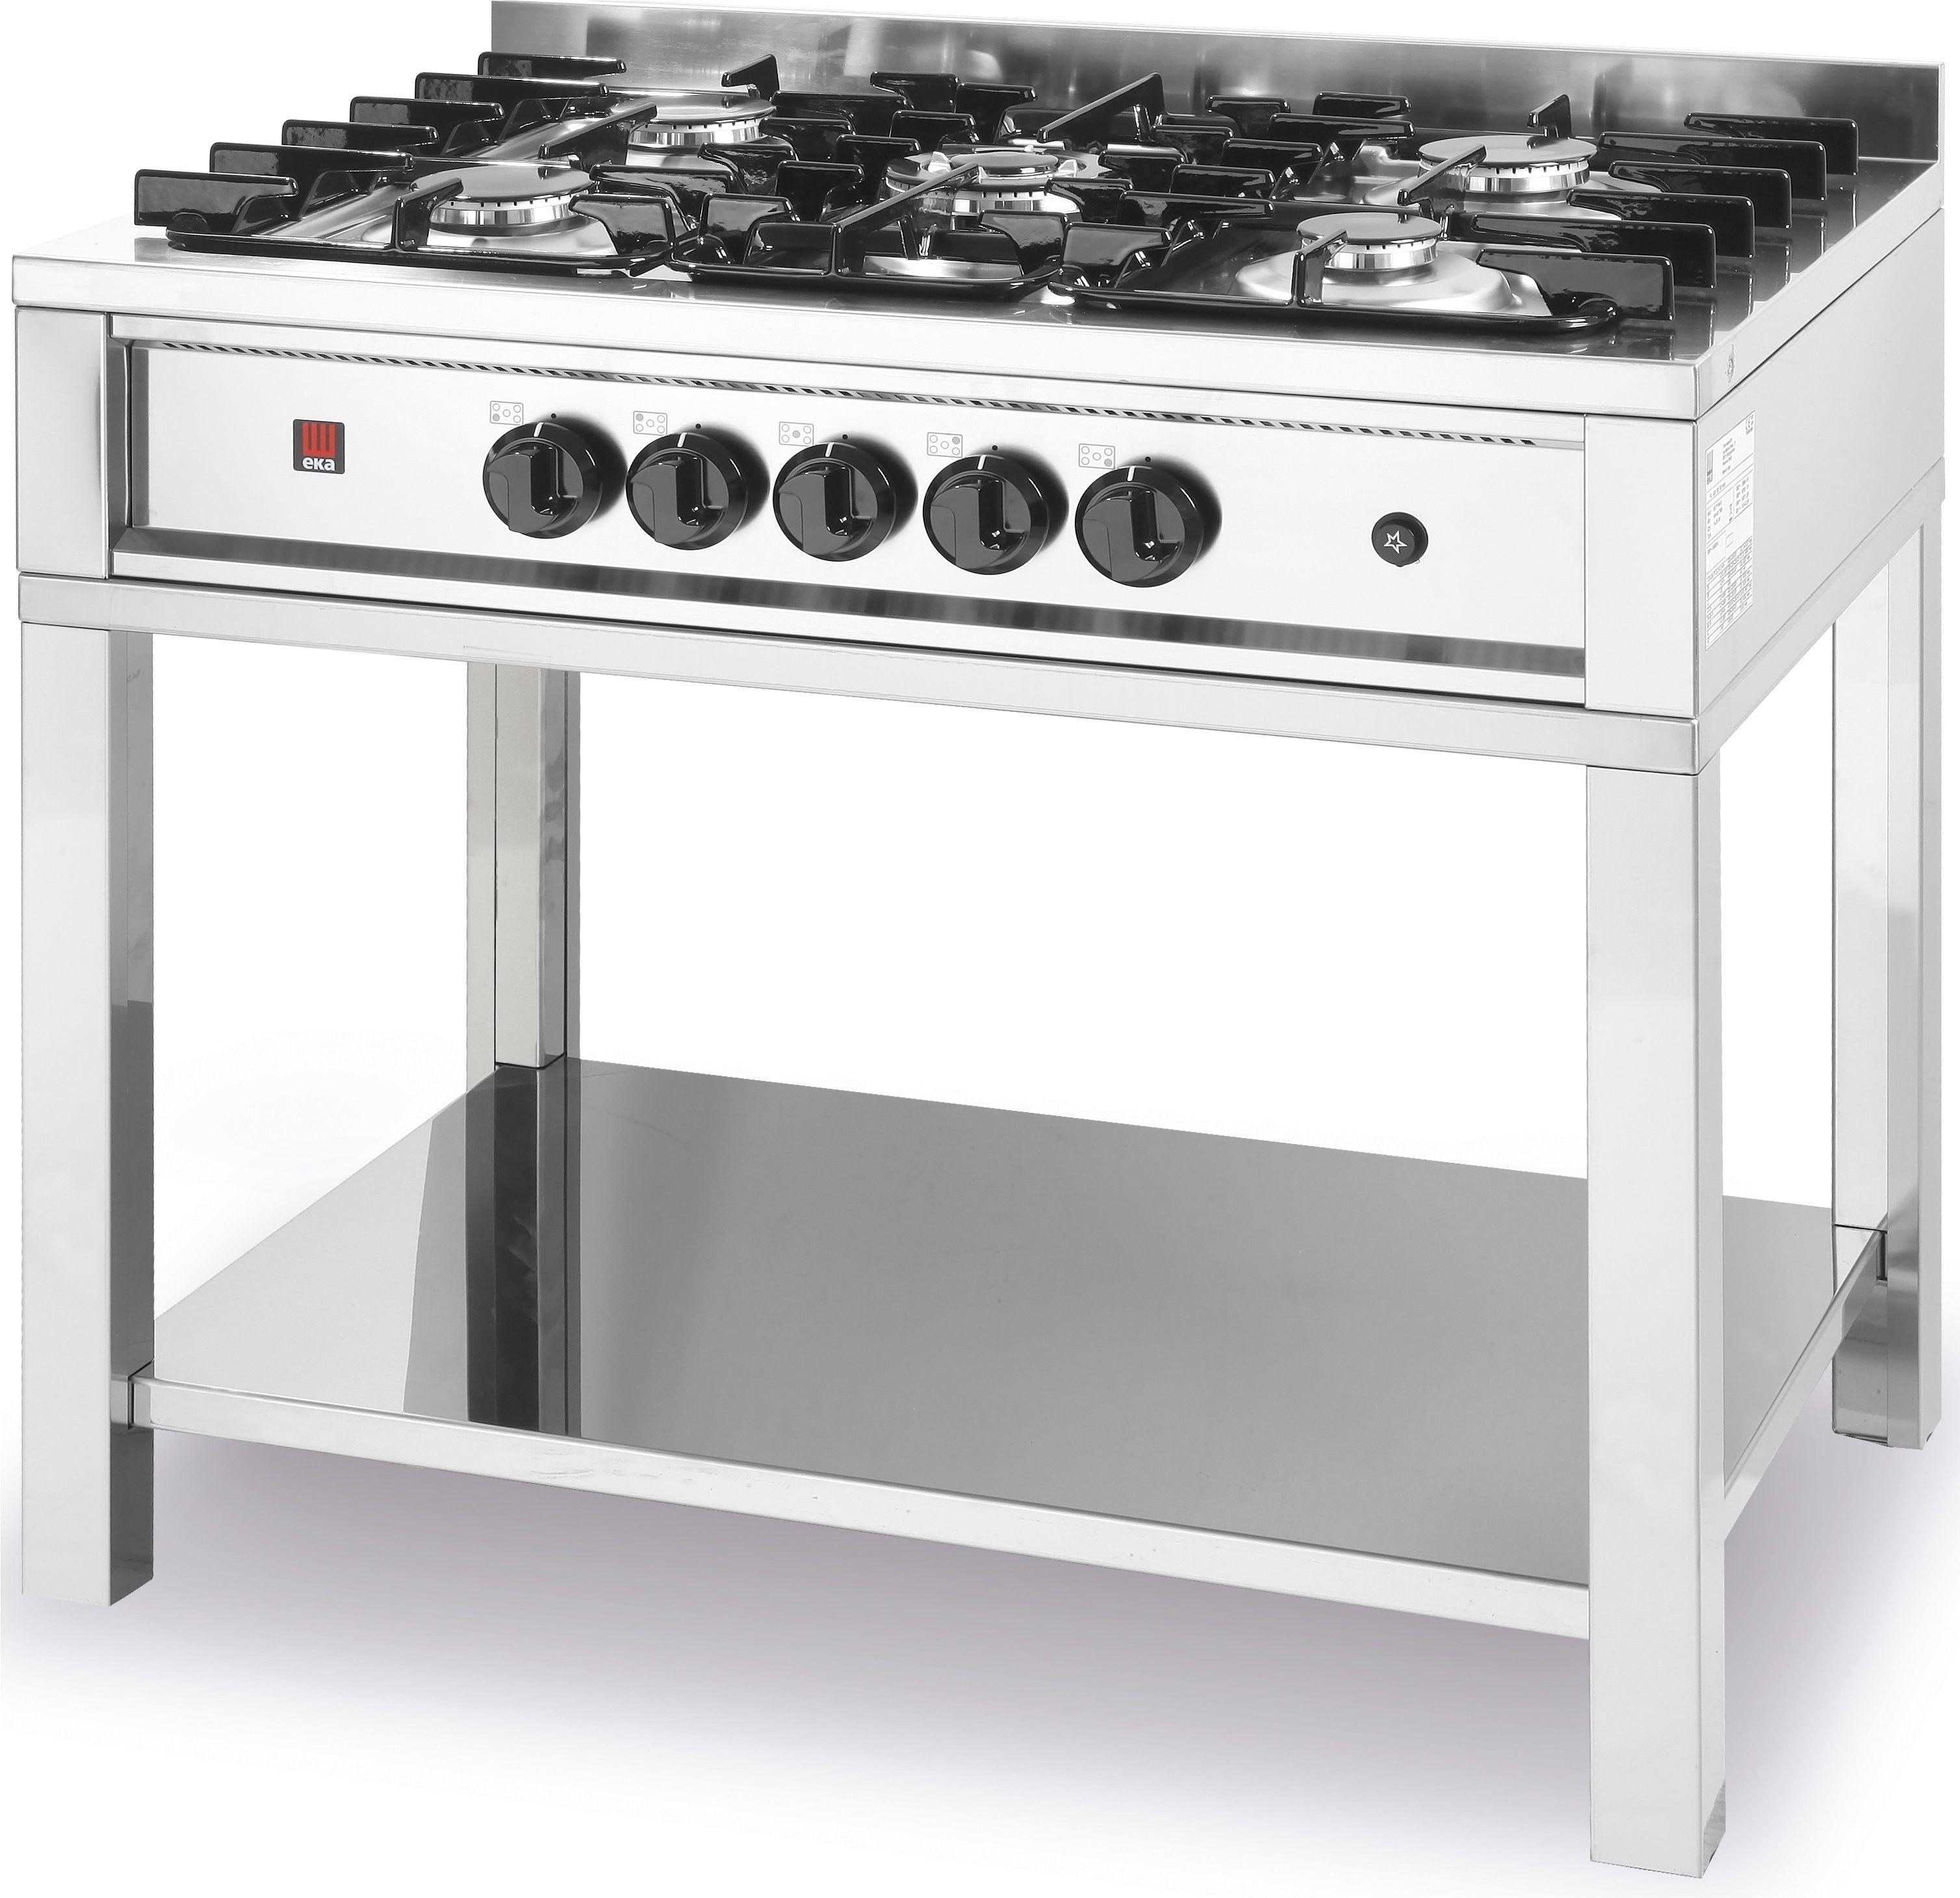 Kuchnia gastronomiczna gazowa 5-palnikowa Kitchen Line